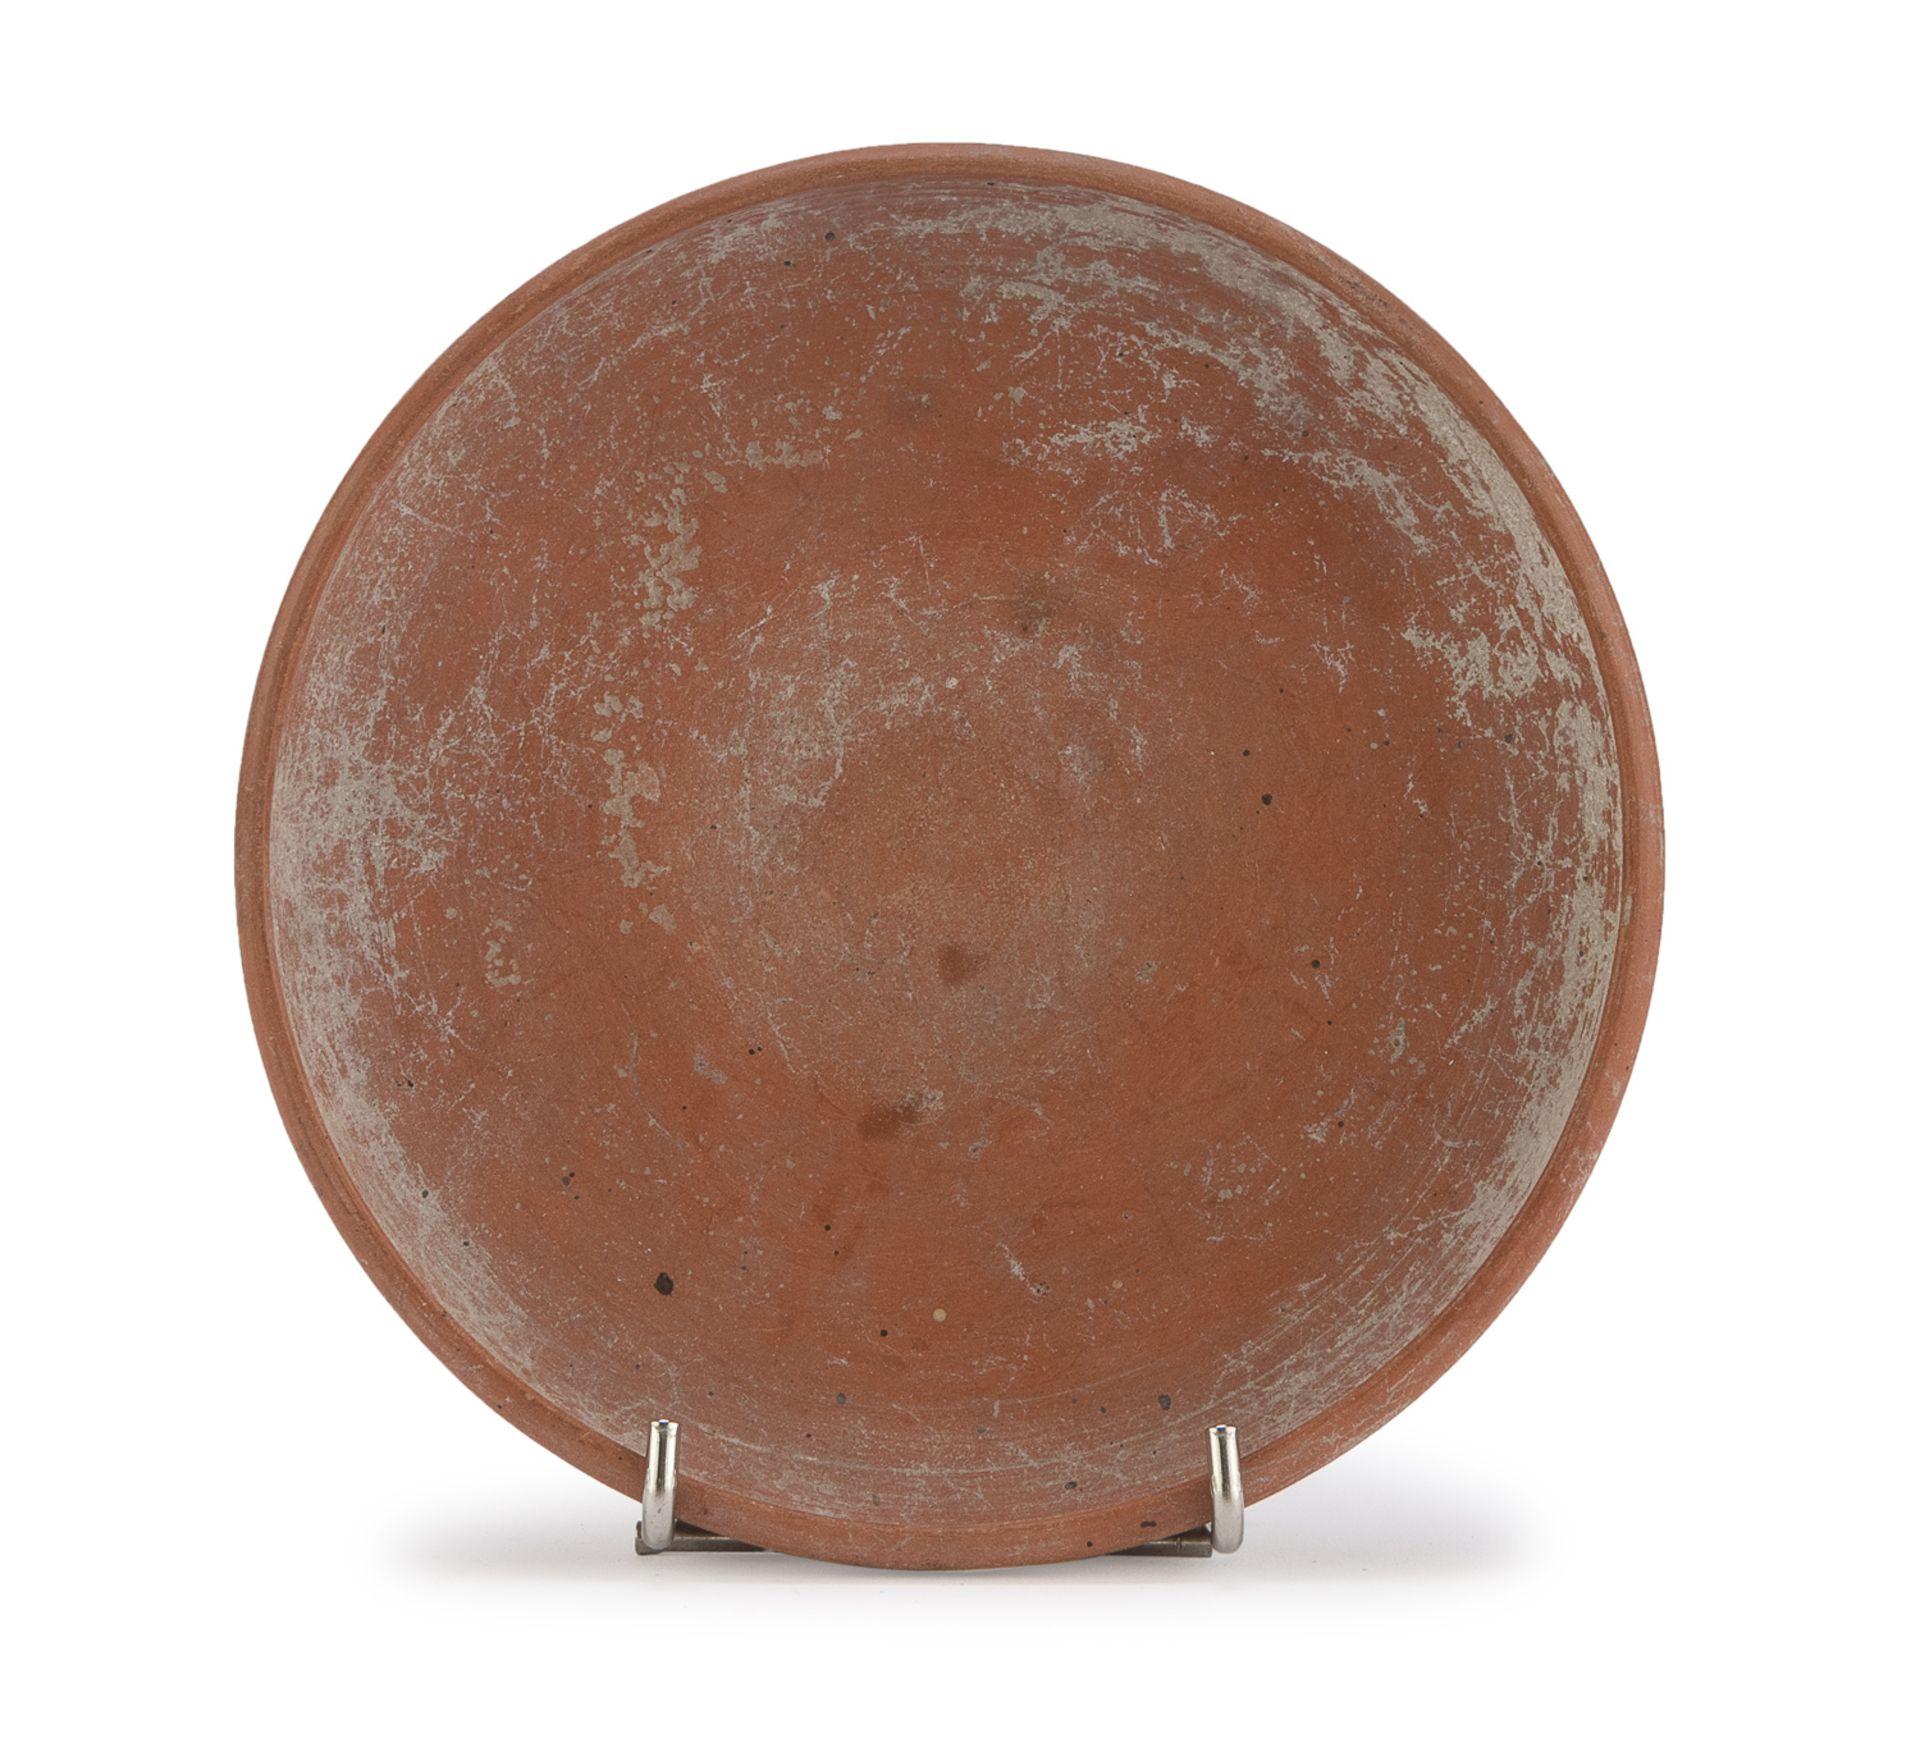 SMALL PLATE ROMAN PERIOD 1st-4th CENTURY